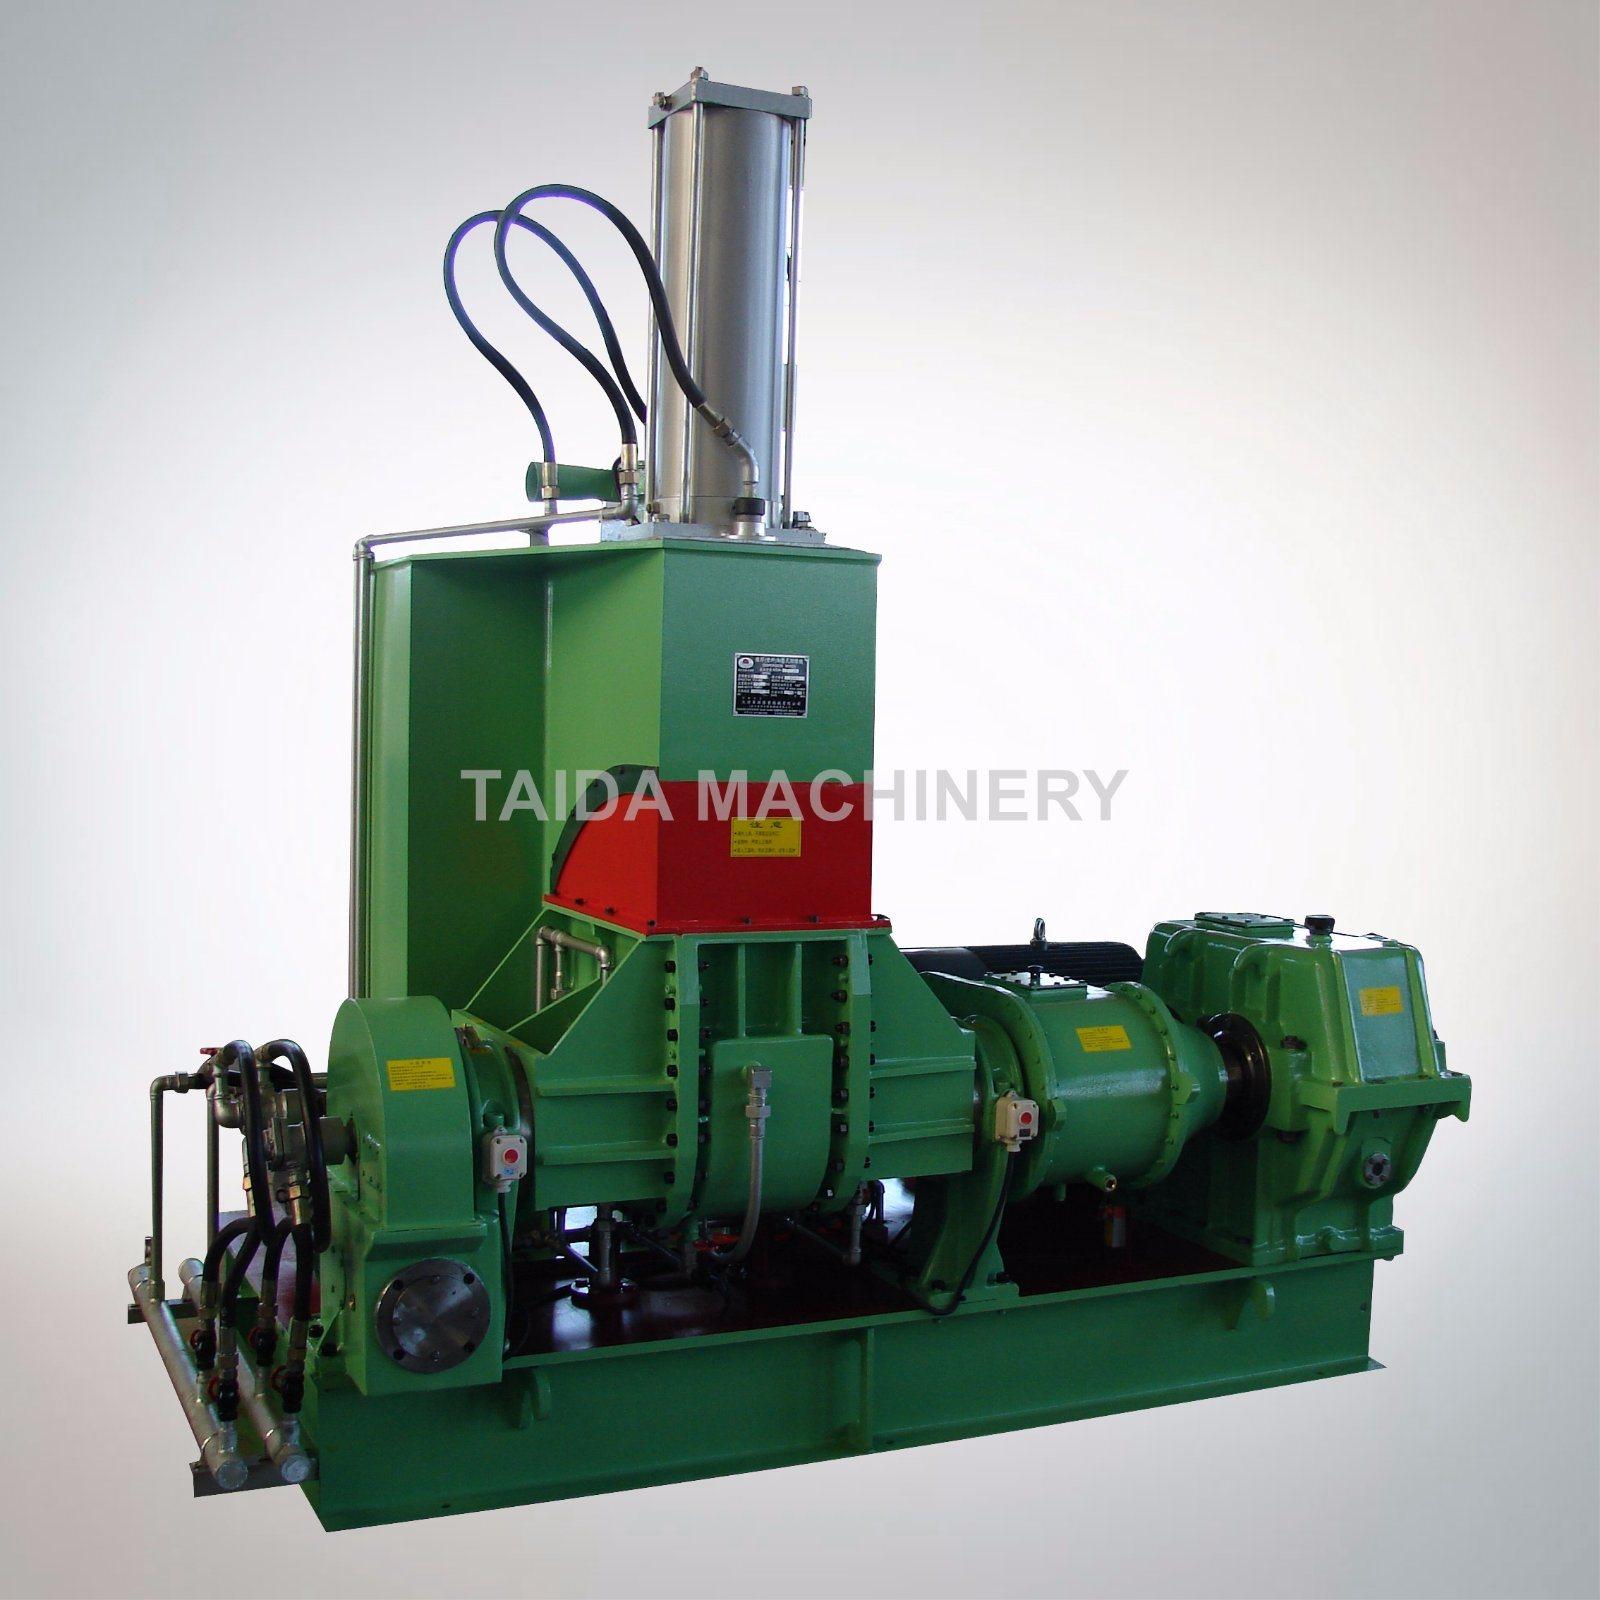 X (S) N-20, 35, 55, 75, 110 Liters Rubber Compounding Dispersion Pressurized Banbury Kneader Mixer Machine